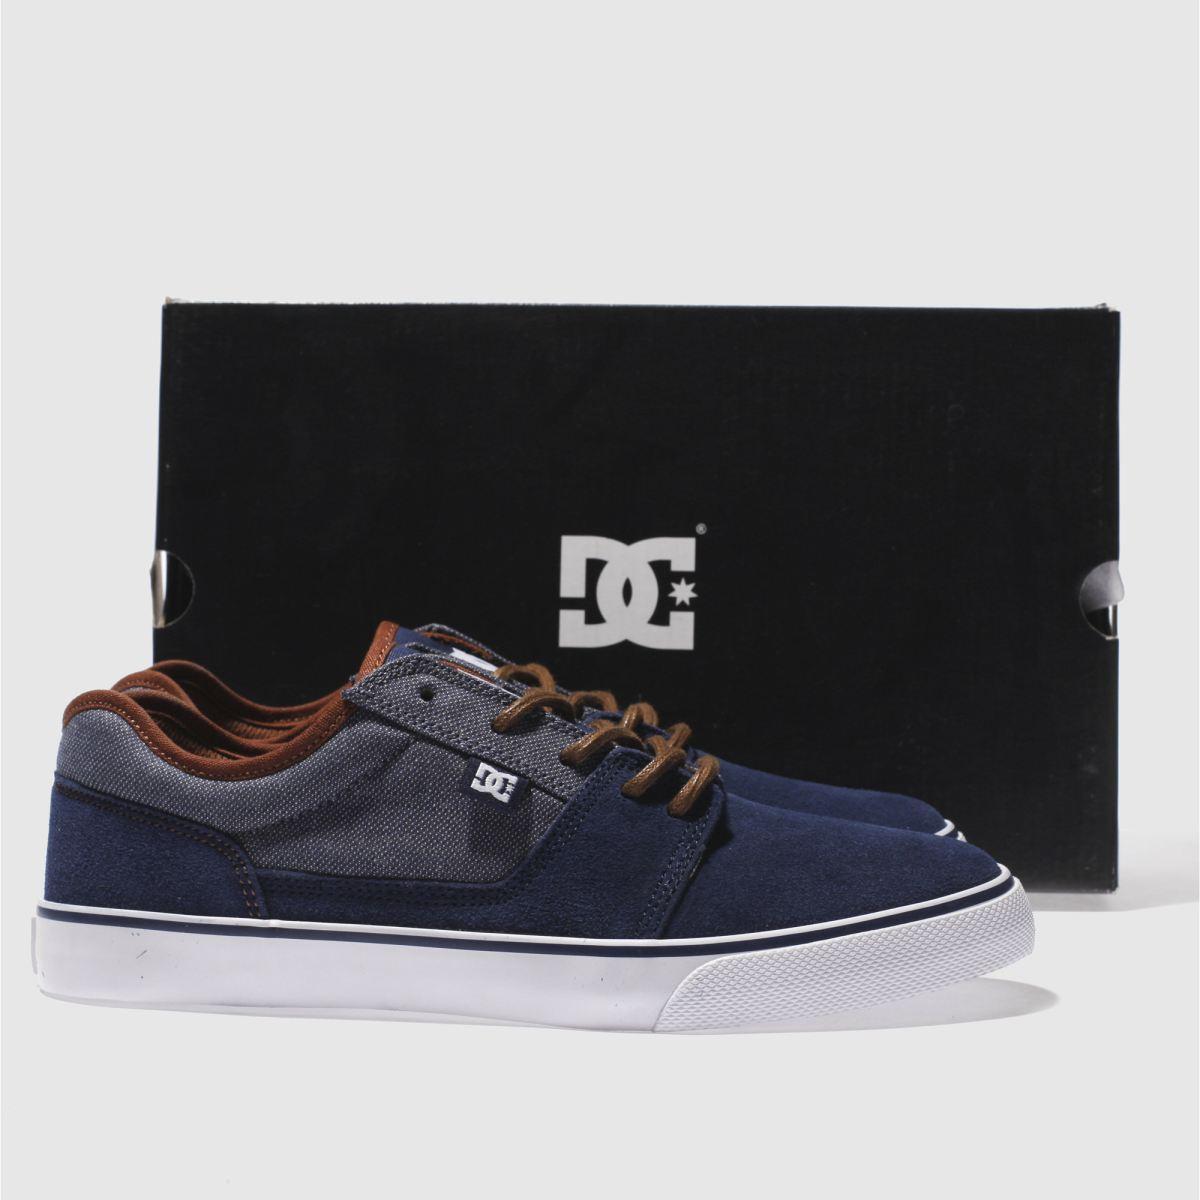 Herren Marineblau Gute dc shoes Tonik Se Sneaker | schuh Gute Marineblau Qualität beliebte Schuhe fdec76